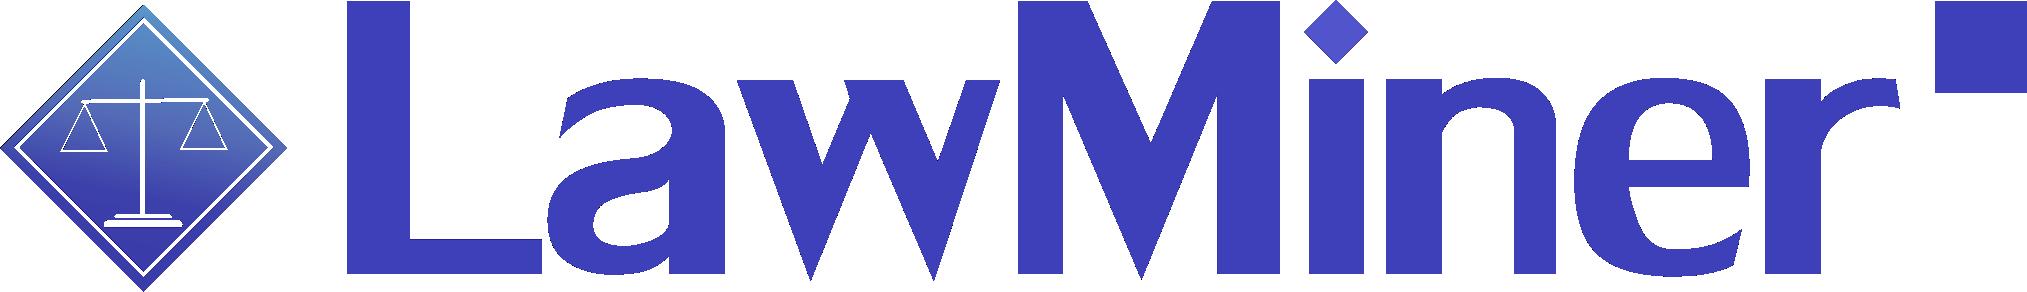 LawMiner-打官司,更Easy,最全面的法律分析平台